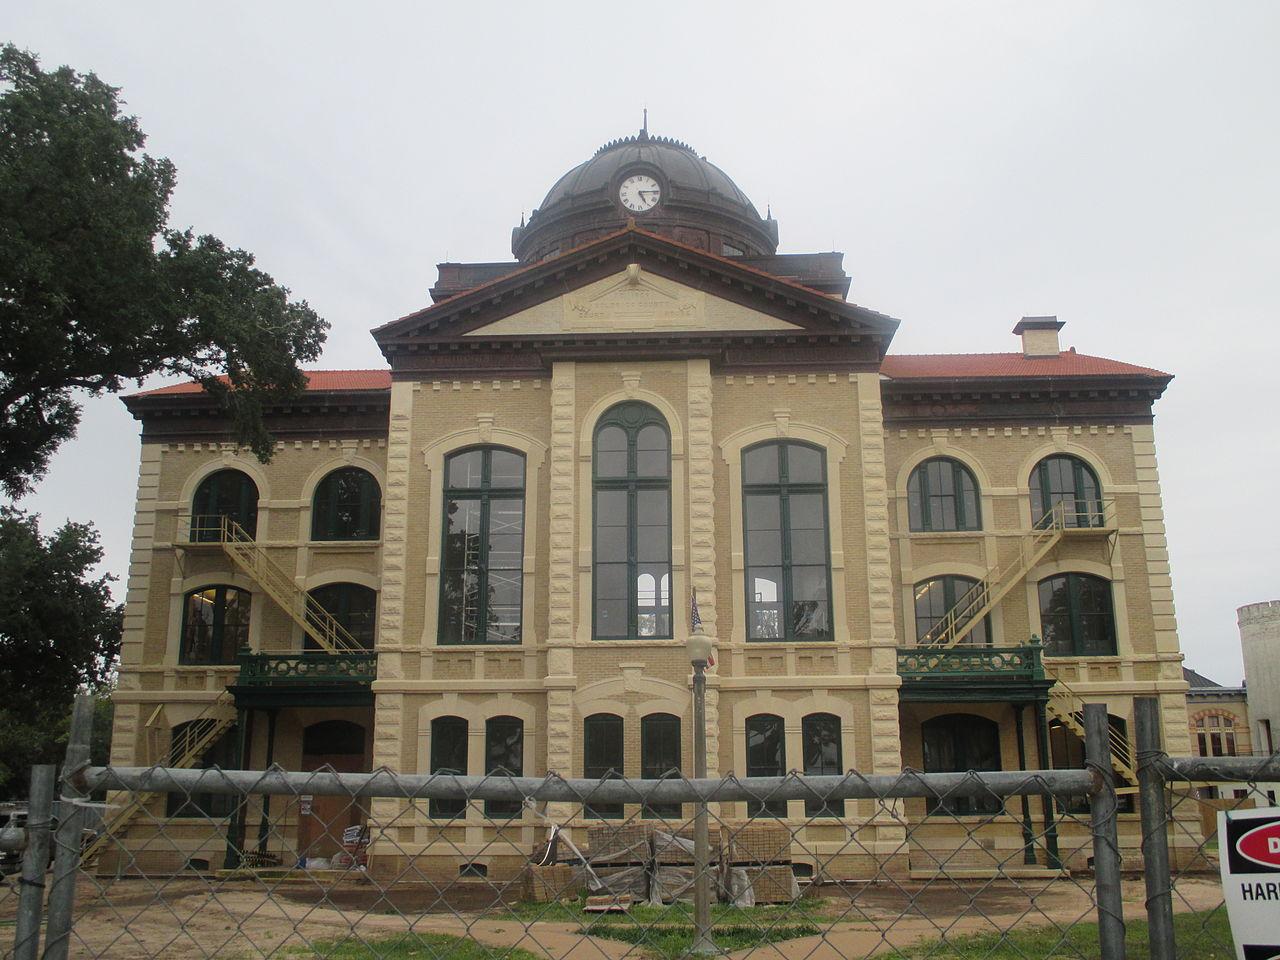 renovation_of_colorado_county_courthouse_columbus_tx_img_8230